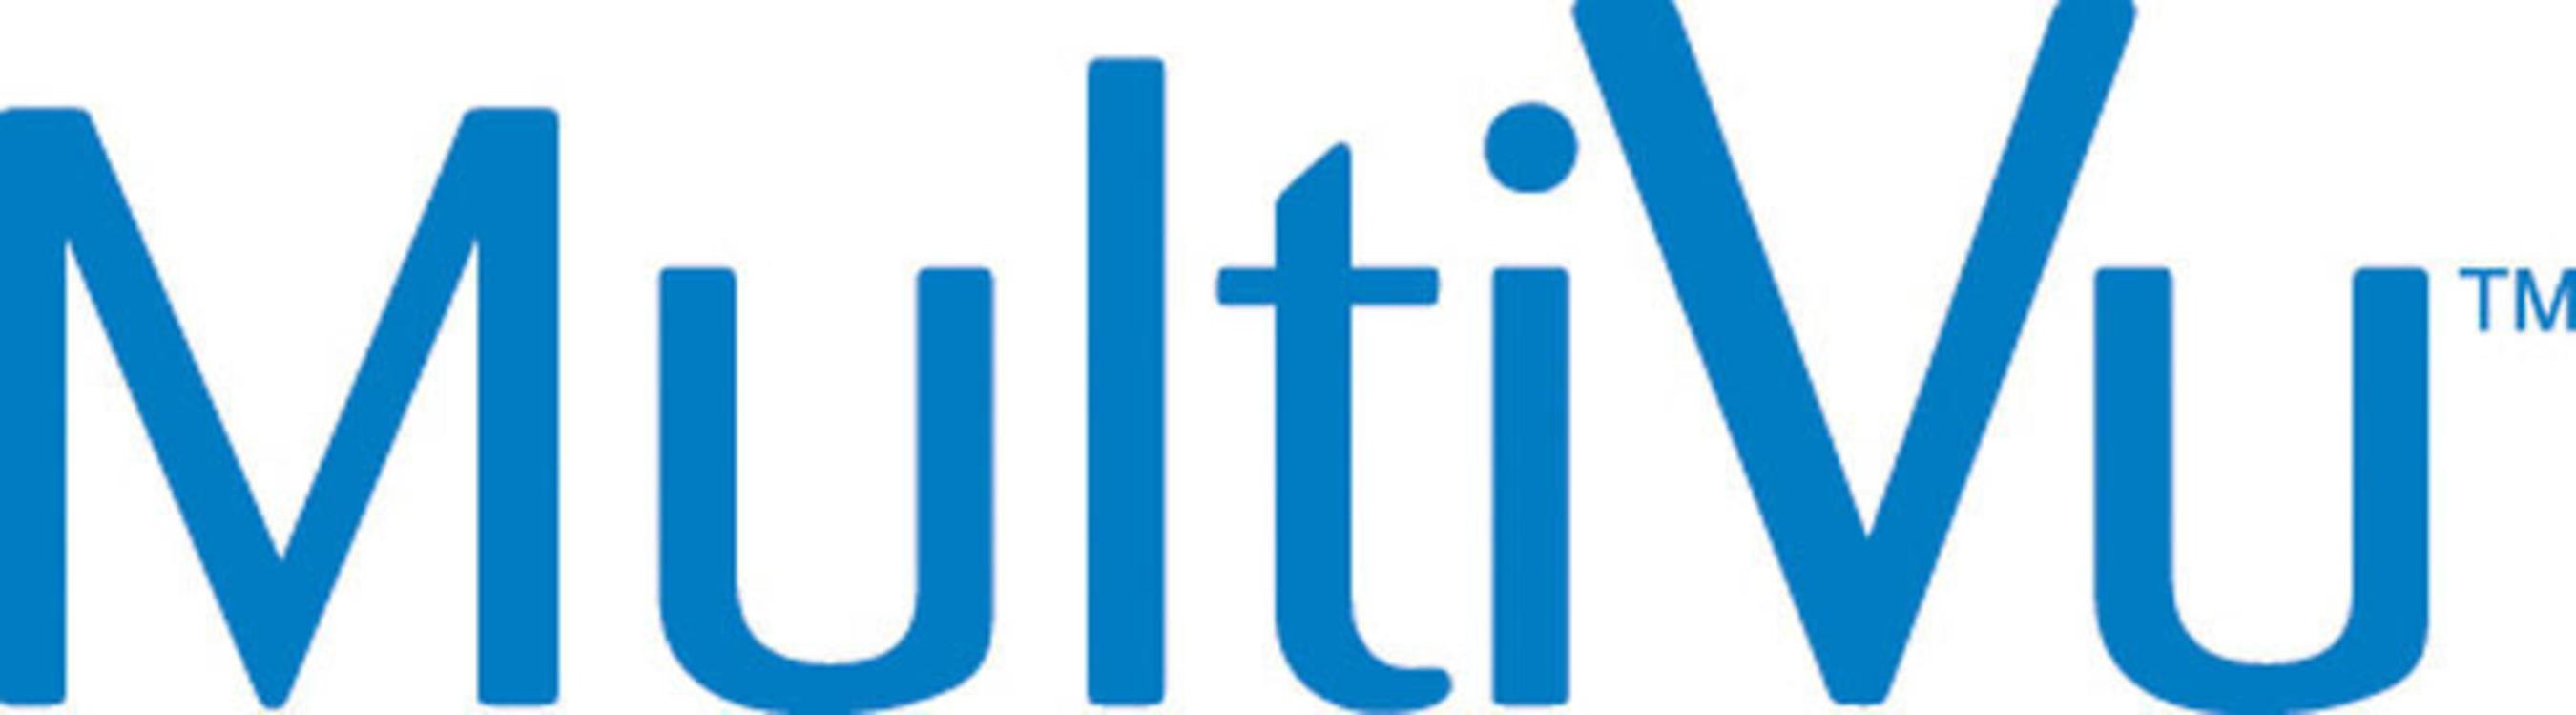 MultiVu Celebrates 10 Years of Innovation in Broadcast & Multimedia Industry. (PRNewsFoto/PR Newswire Association LLC) (PRNewsFoto/)